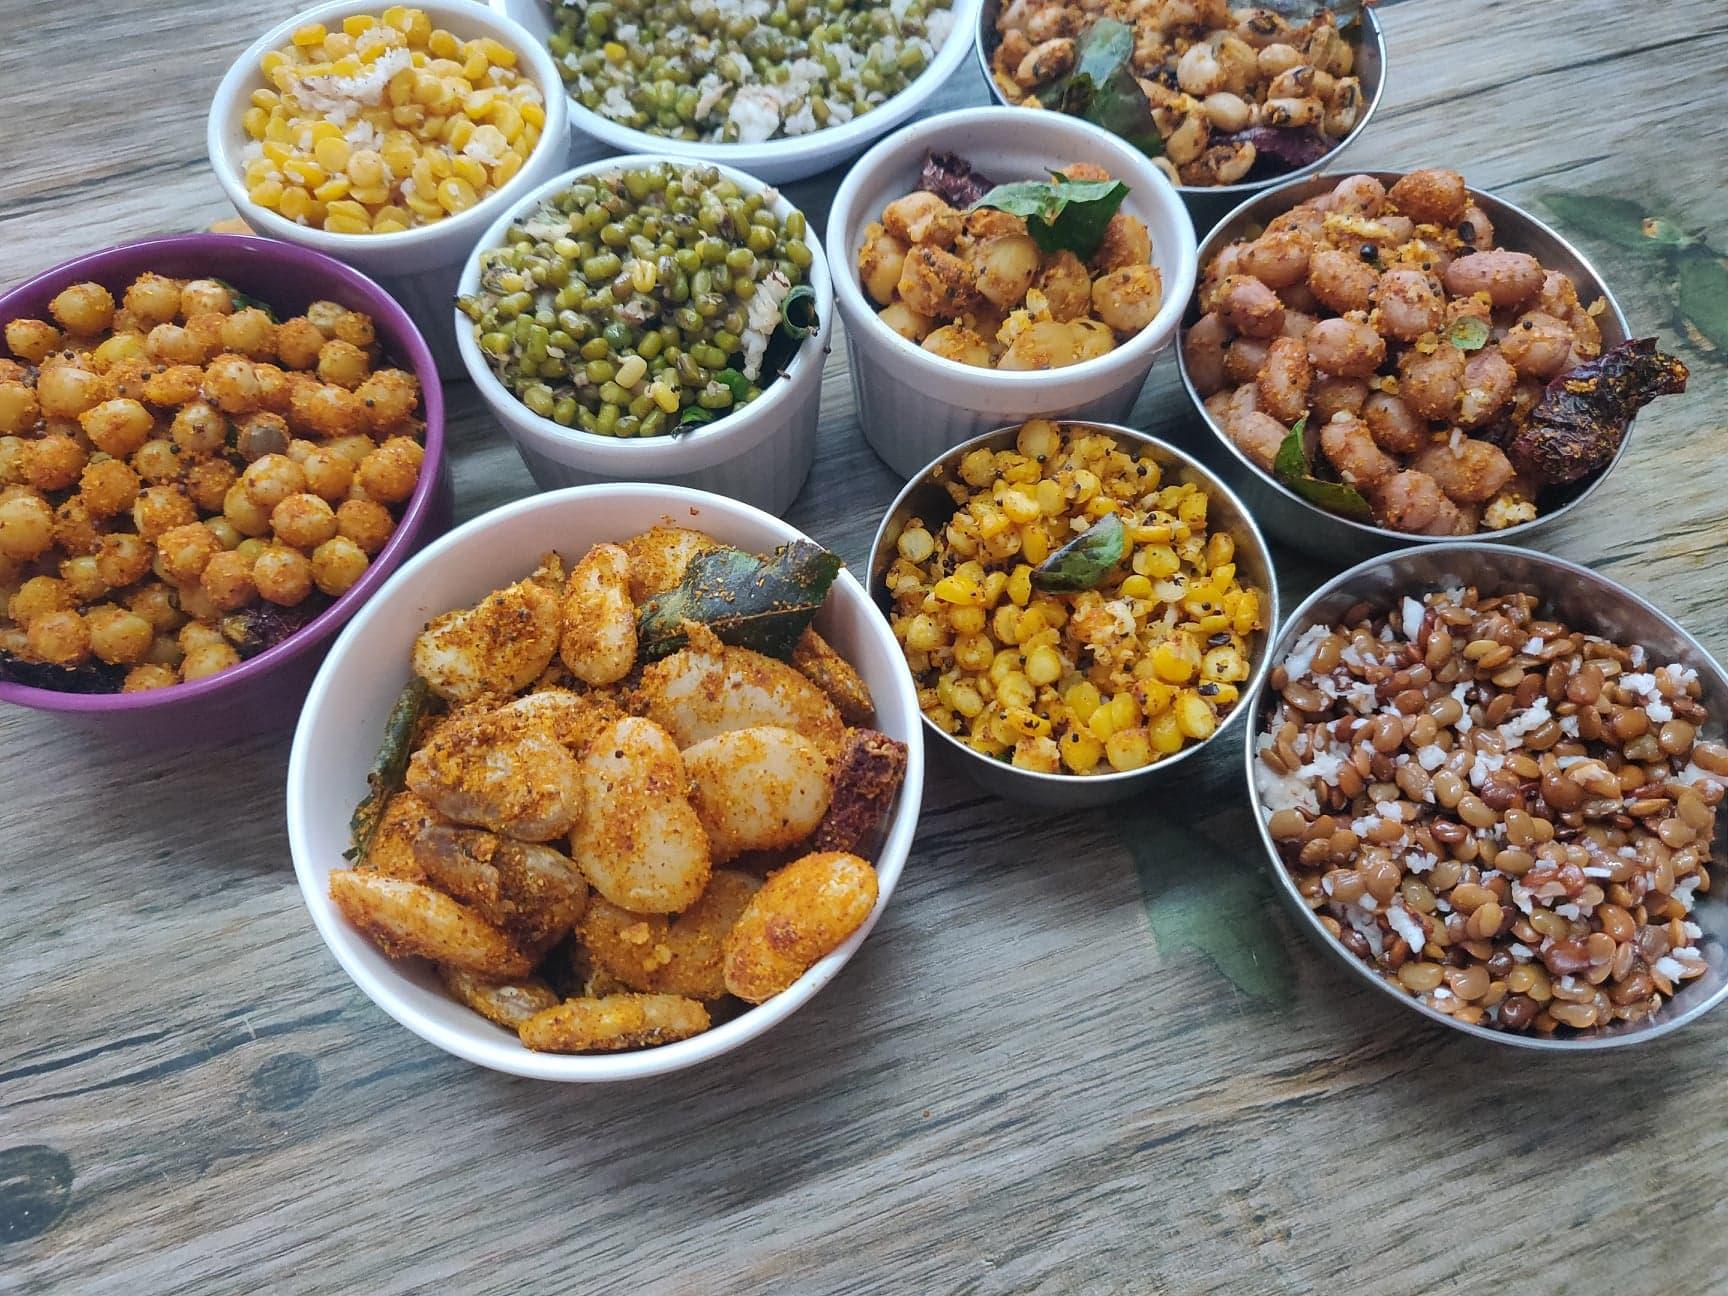 Navrathri_sundal_varieties - 121675838_684340268861187_6829206989788218237_n